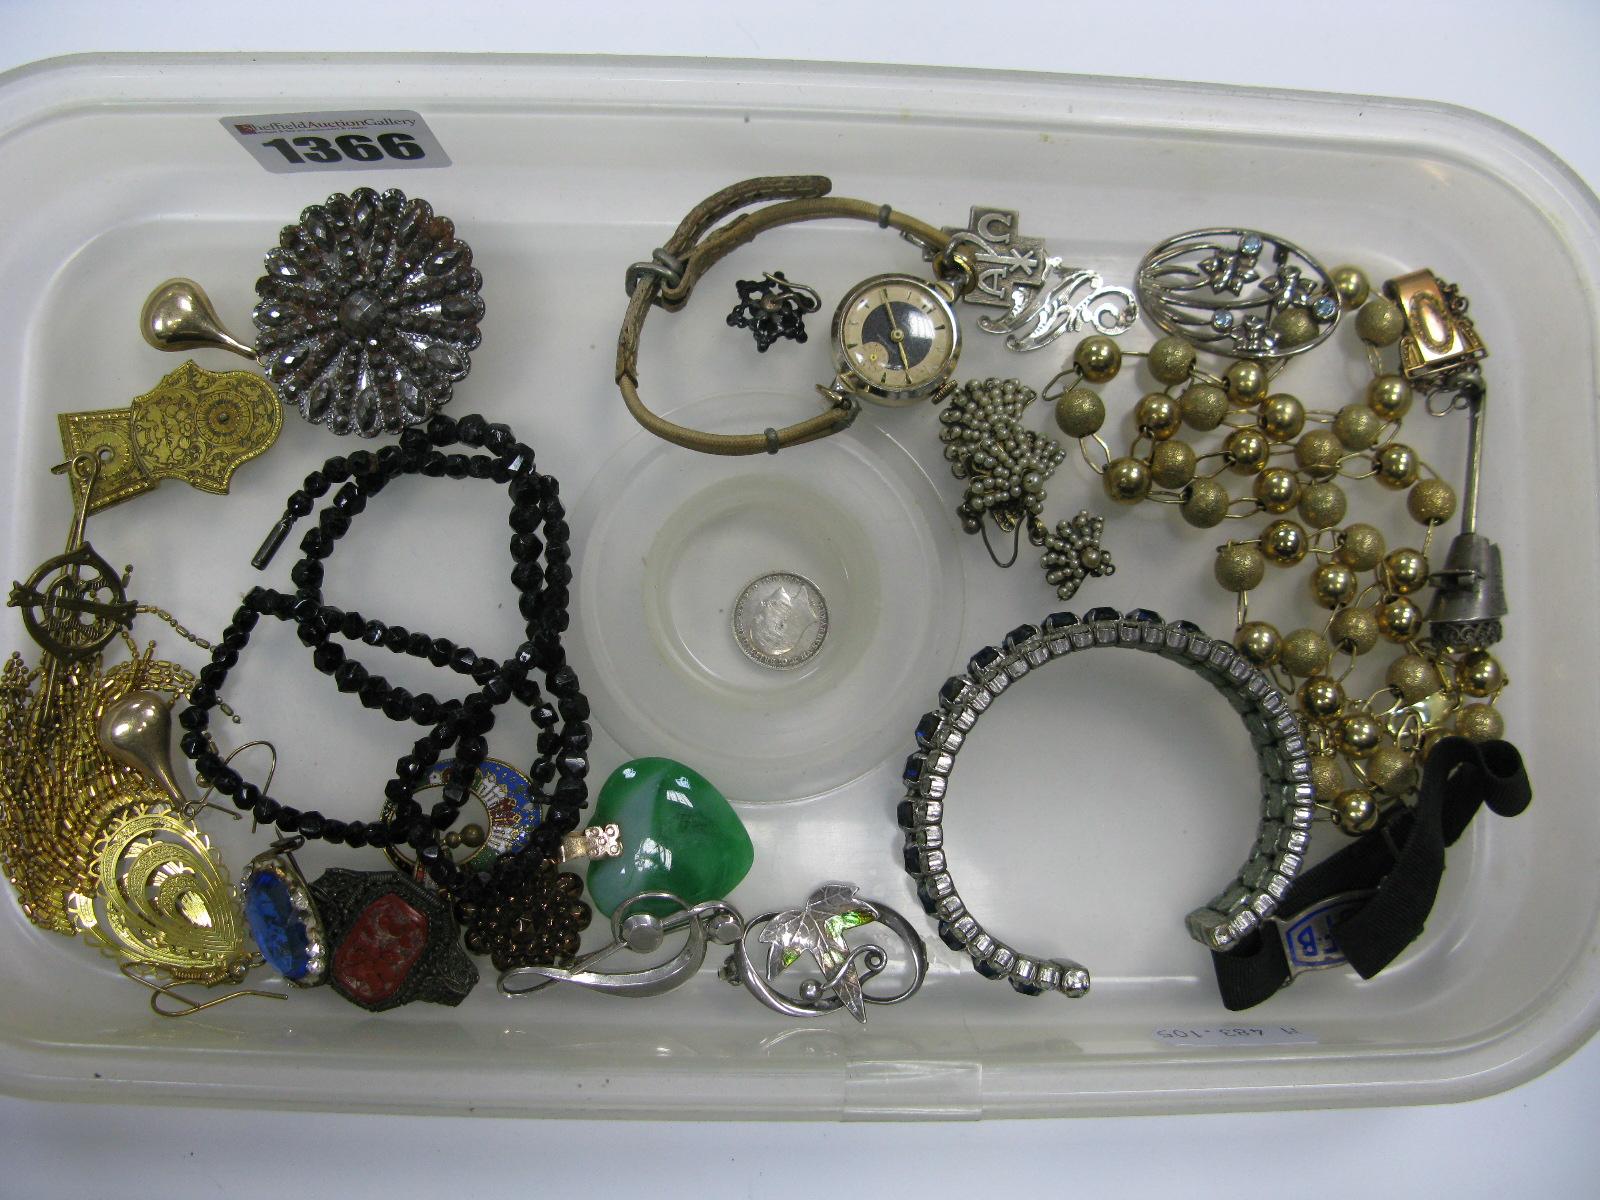 Lot 1366 - Blue and White Diamanté Bangle, earrings, vintage ladies wristwatches, necklace, brooches, pendants,